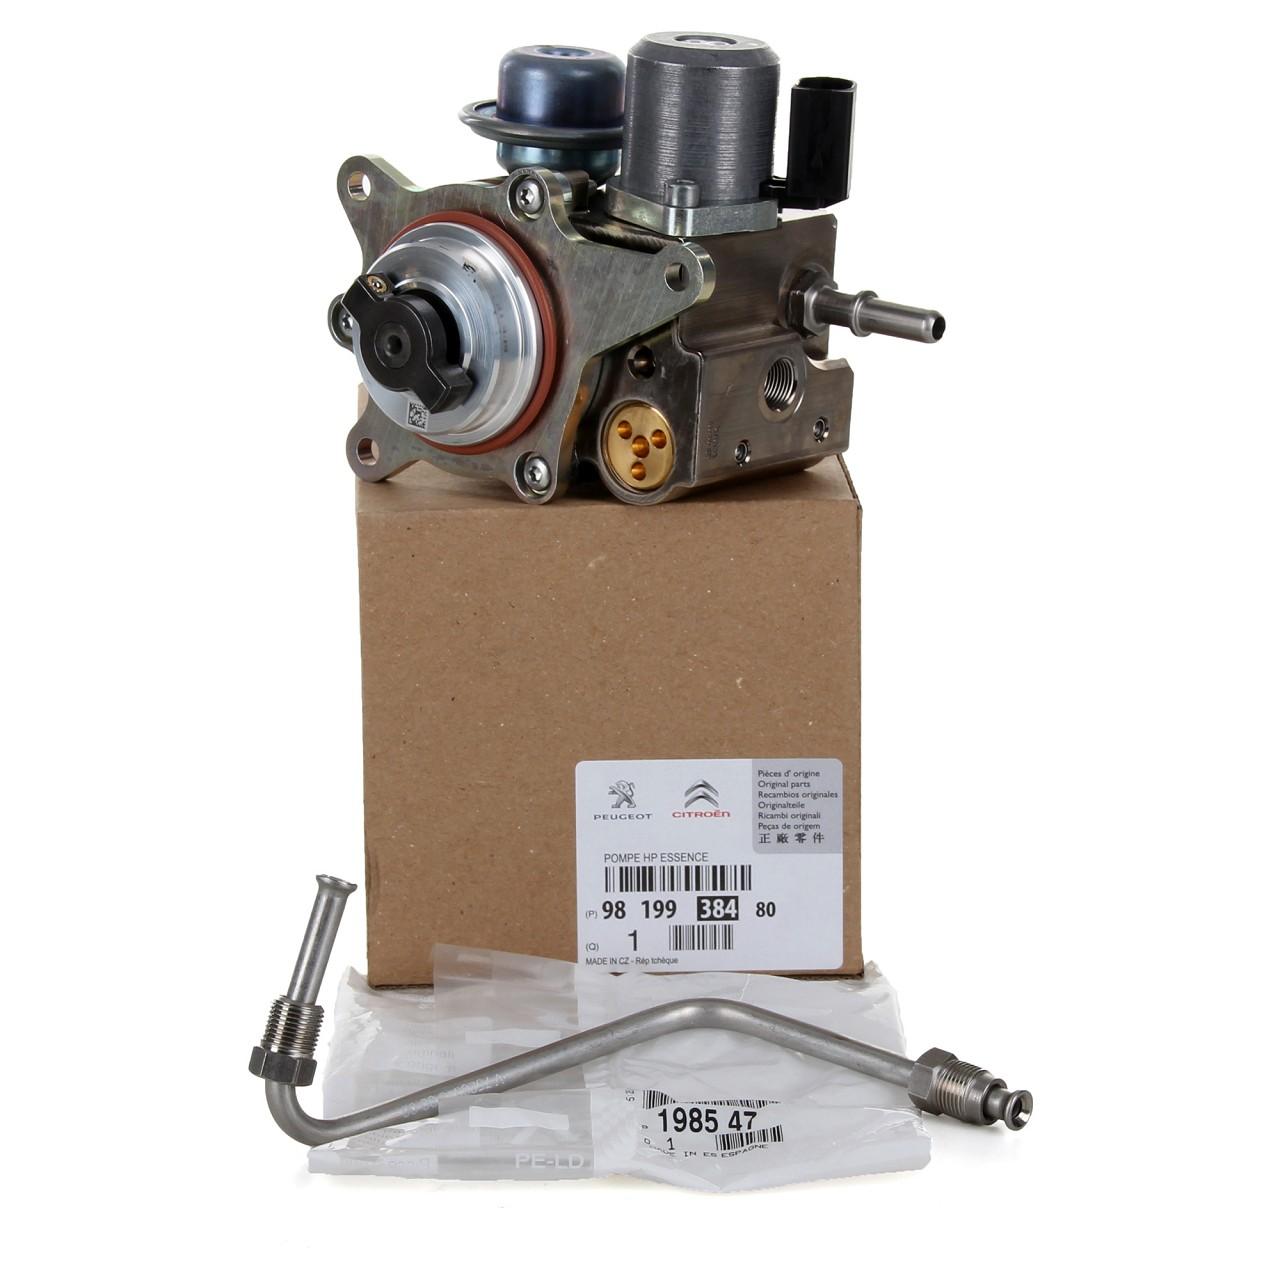 ORIGINAL Citroen Kraftstoffpumpe 9819938480 + Kraftstoffleitung 1985.47 für 1.6